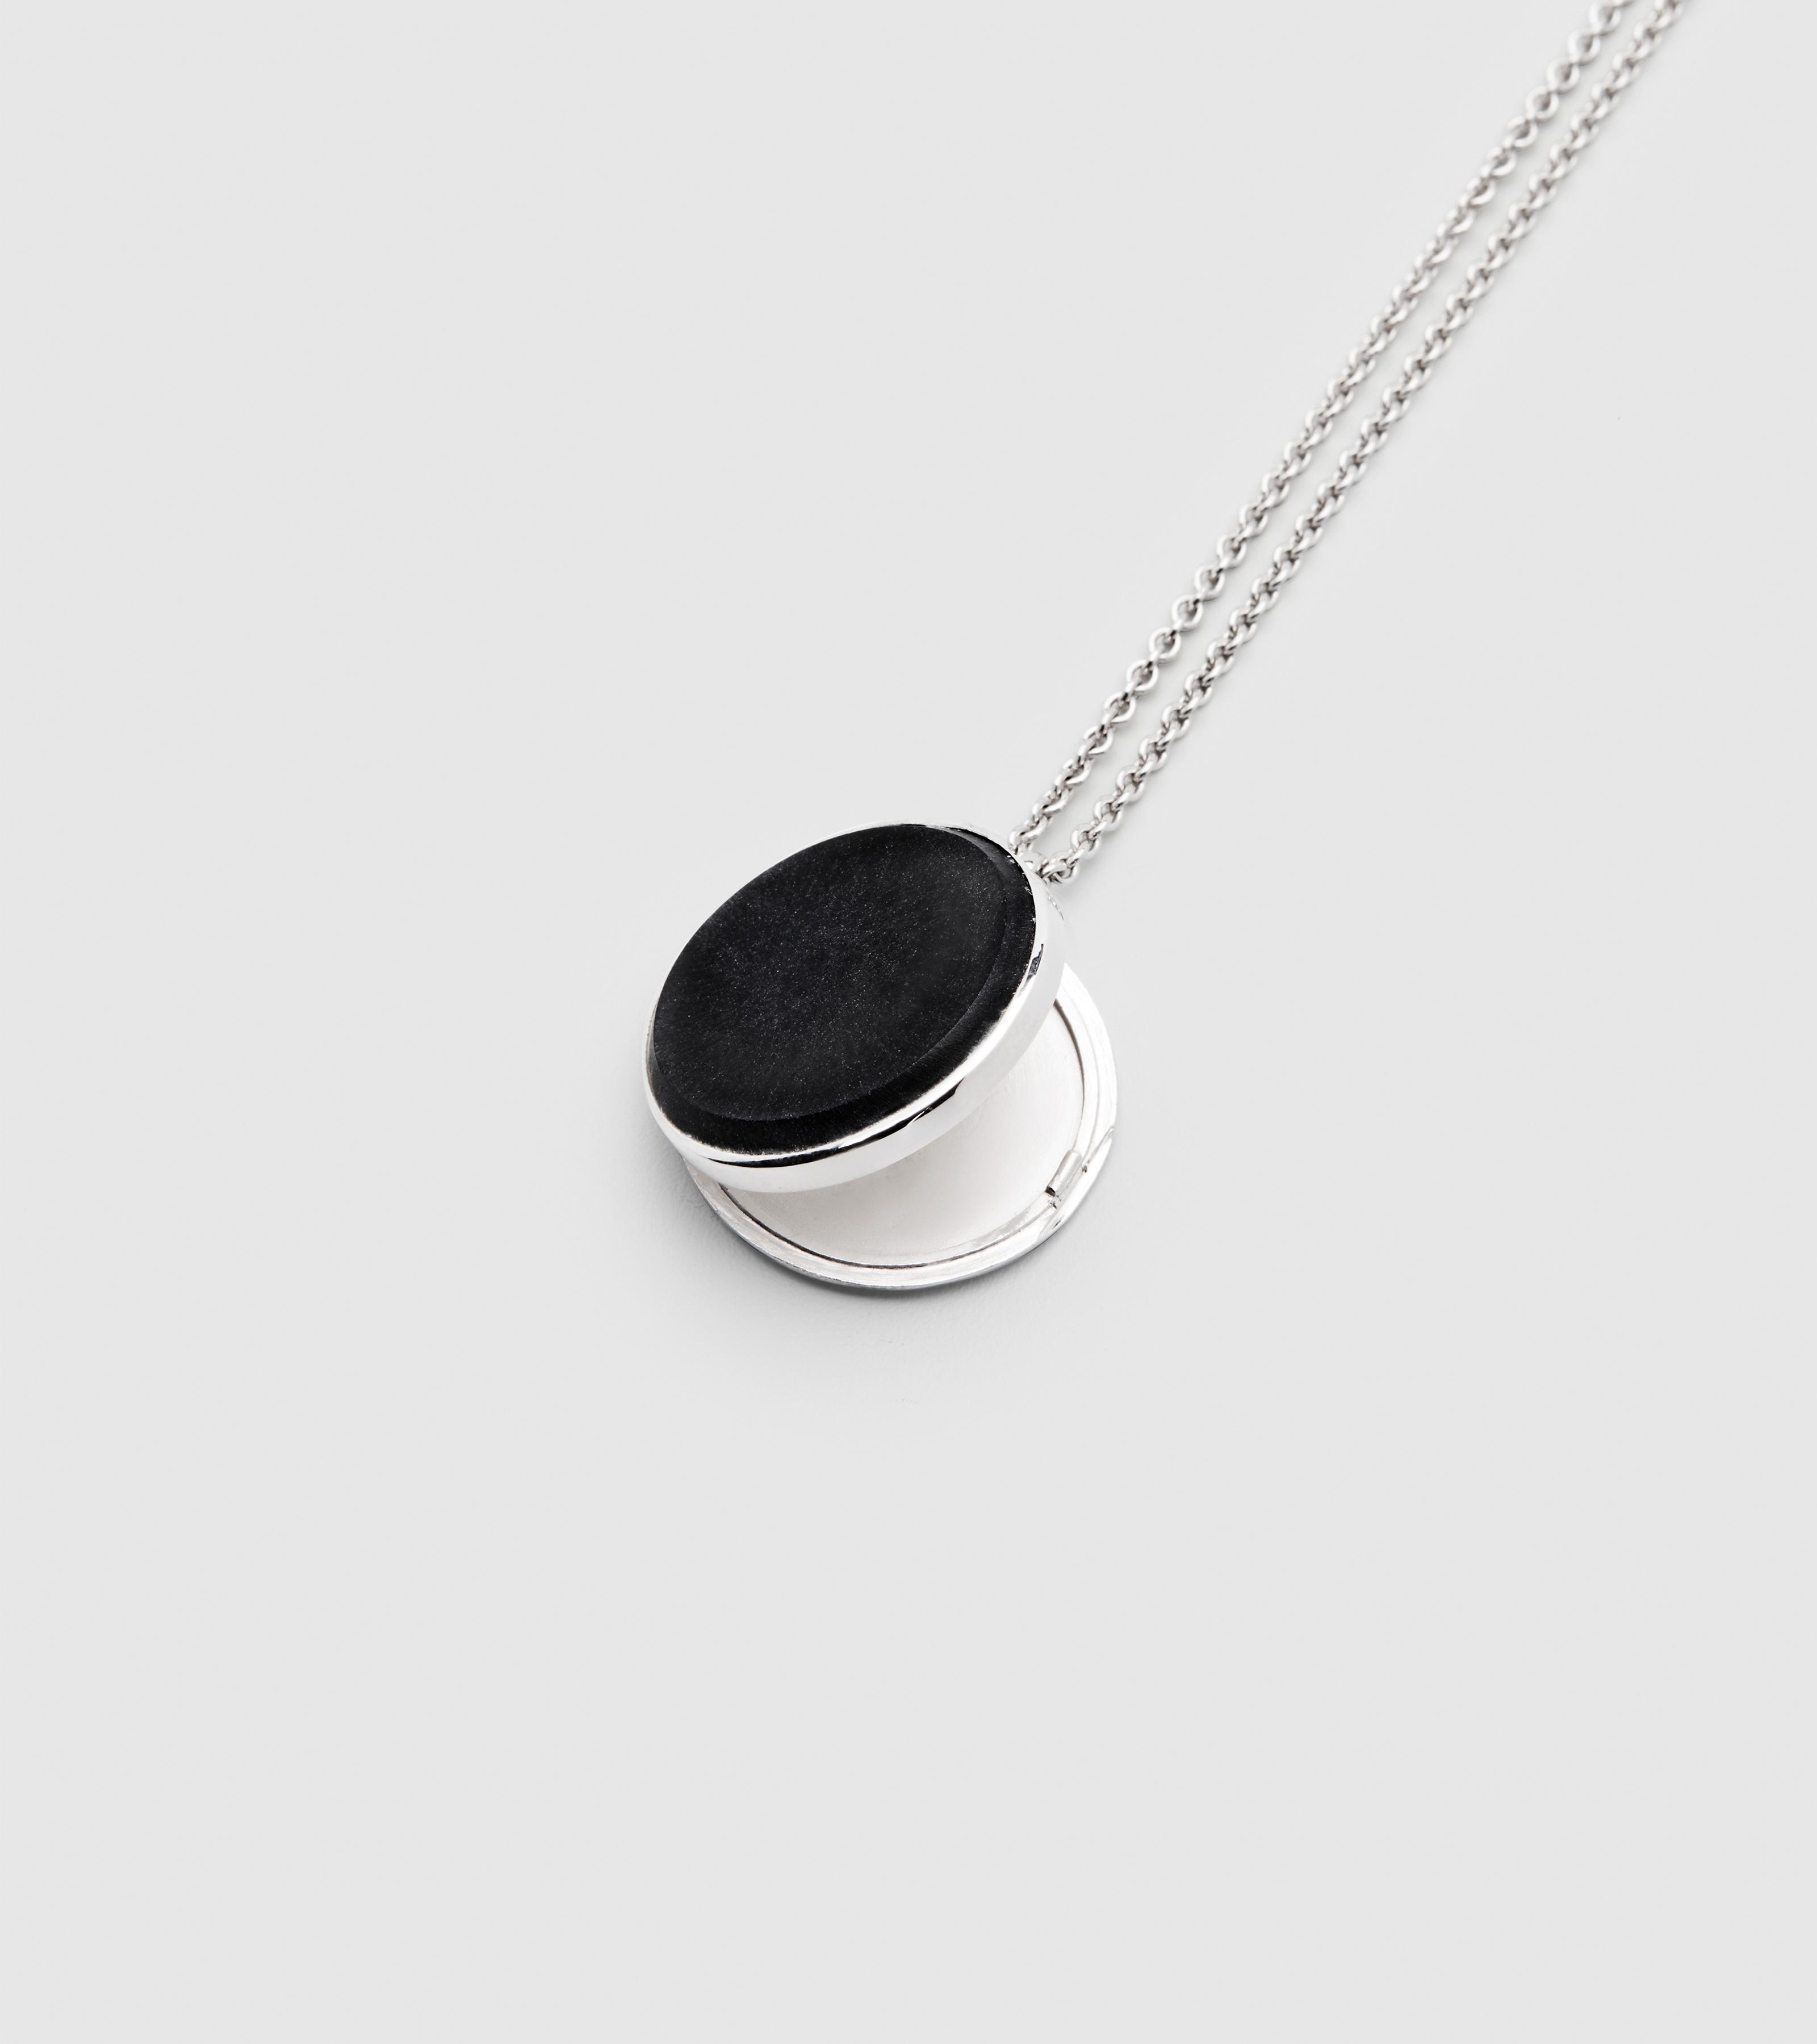 Medallion Black Onyx